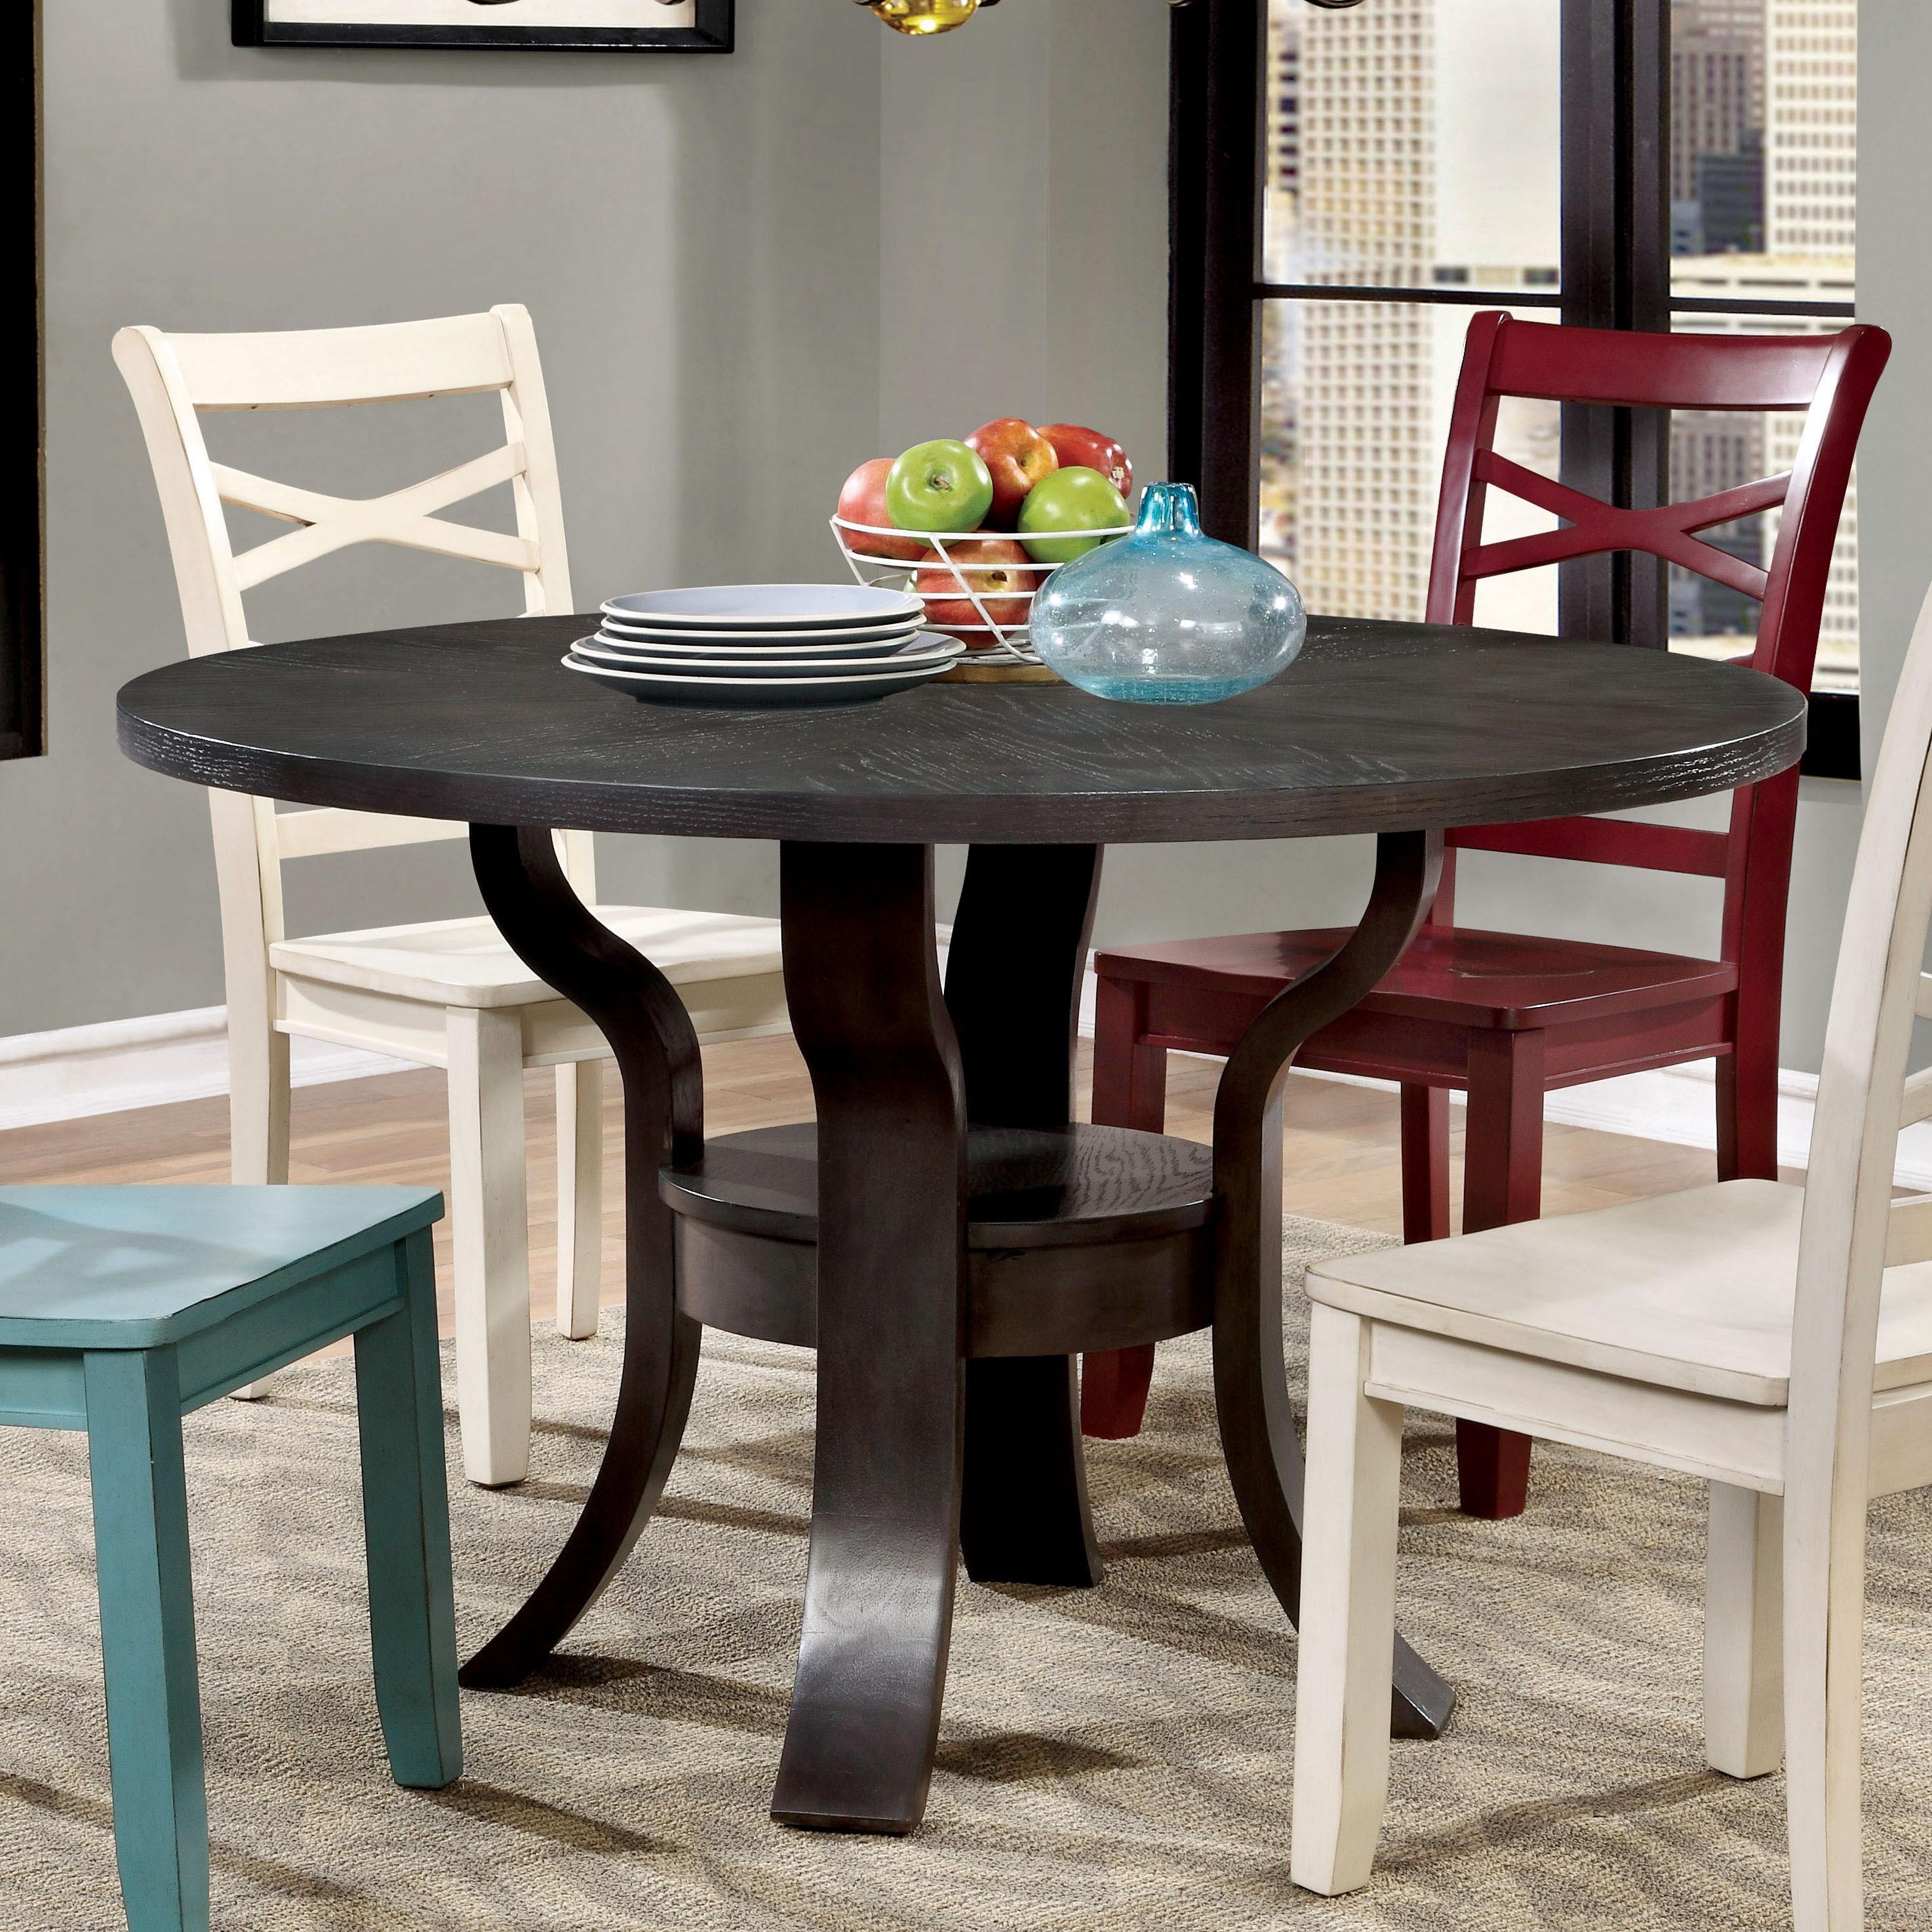 Furniture Of America Crane Simple Espresso Round Dining Table